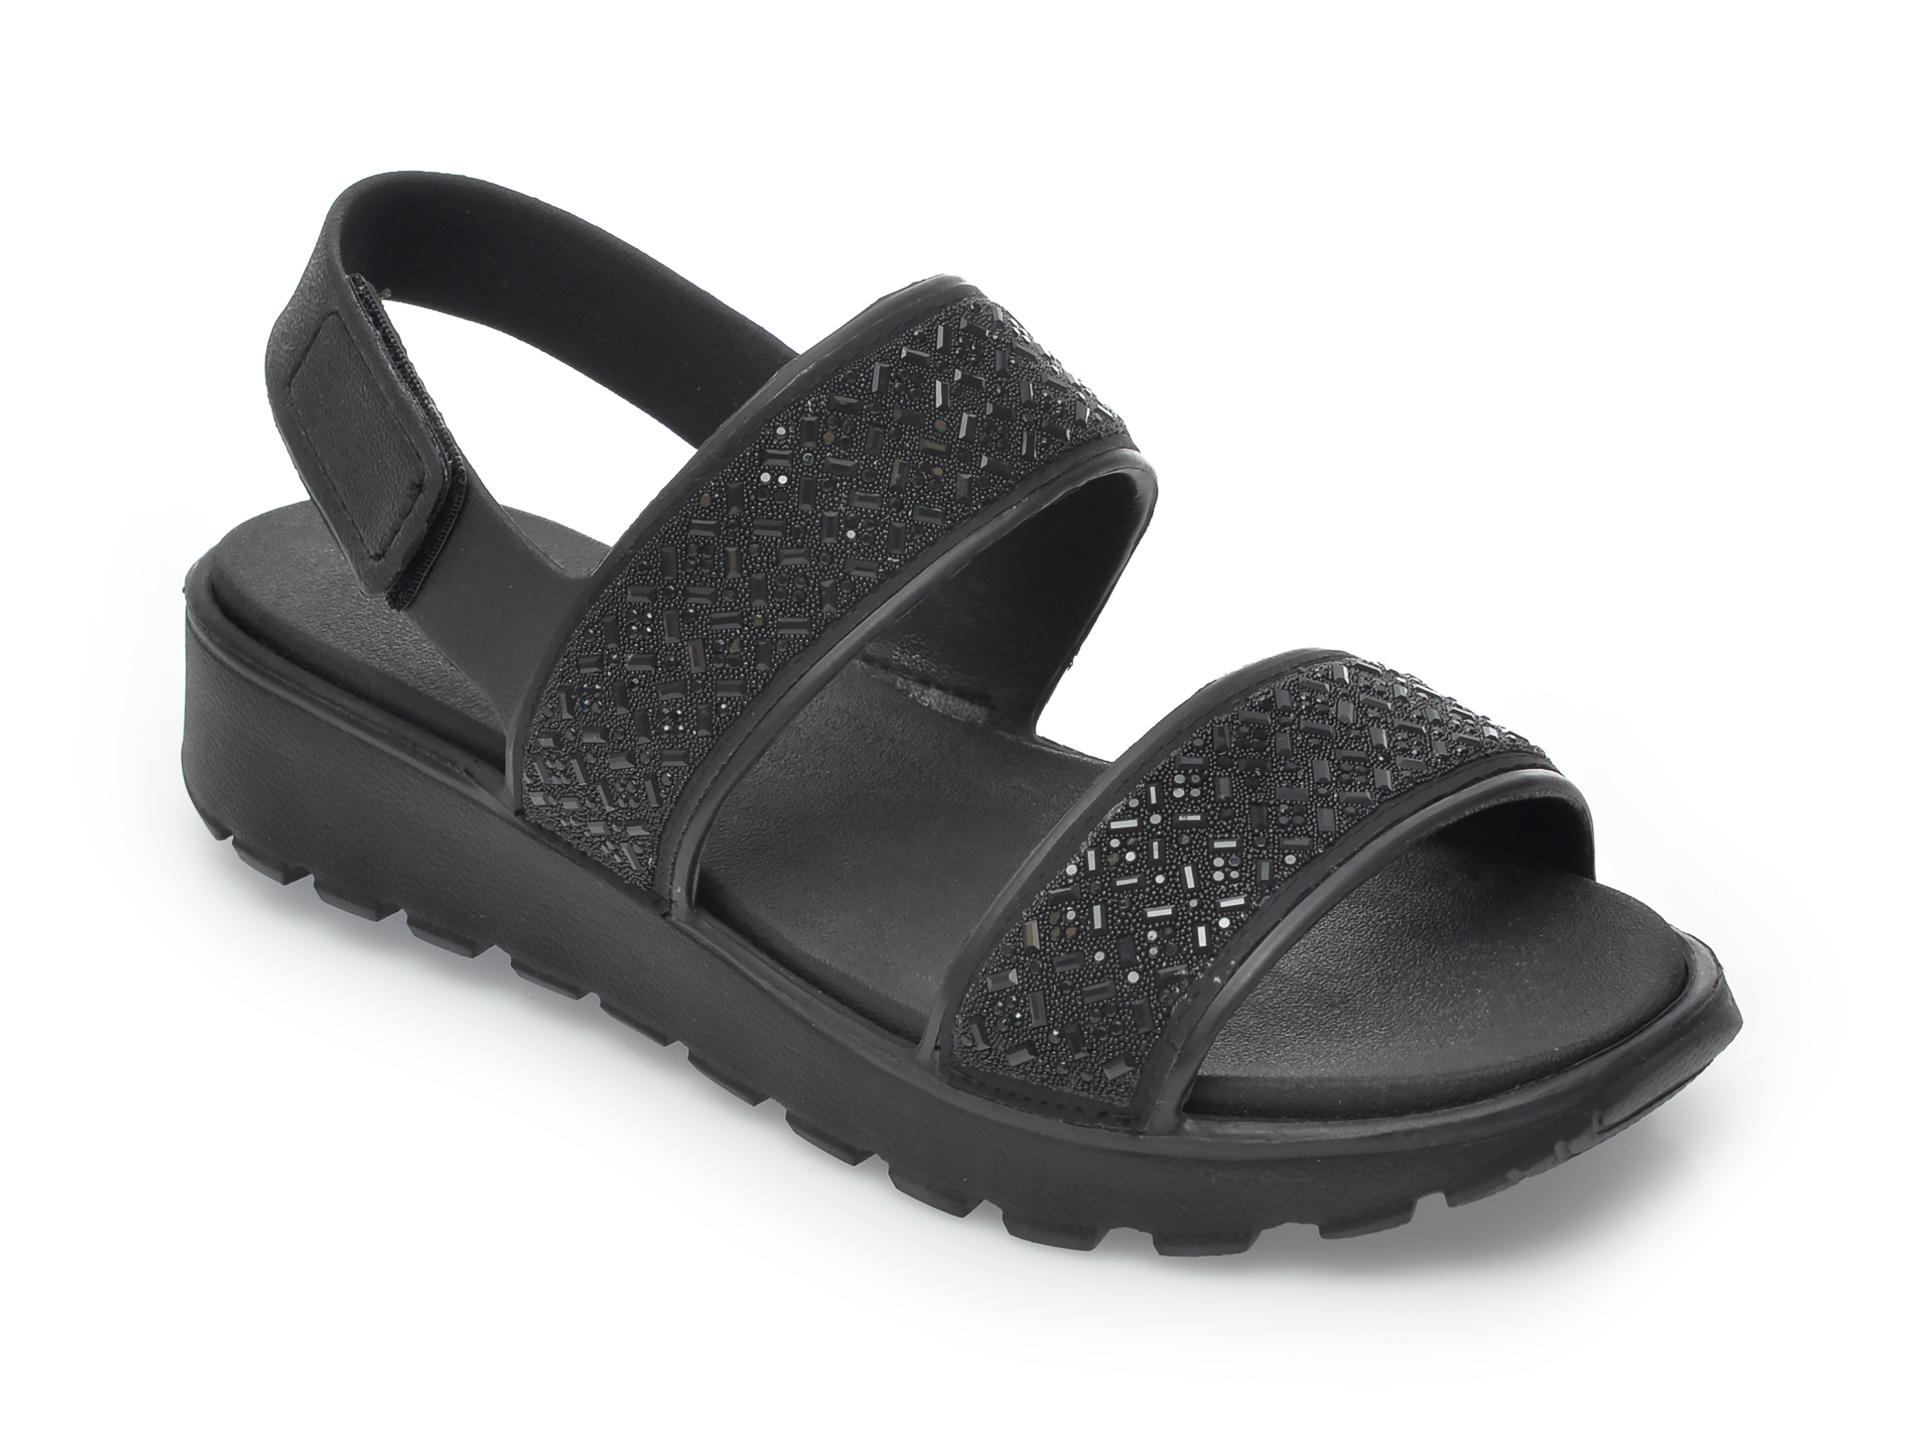 Sandale SKECHERS negre, Footsteps Glam Party, din piele ecologica imagine otter.ro 2021